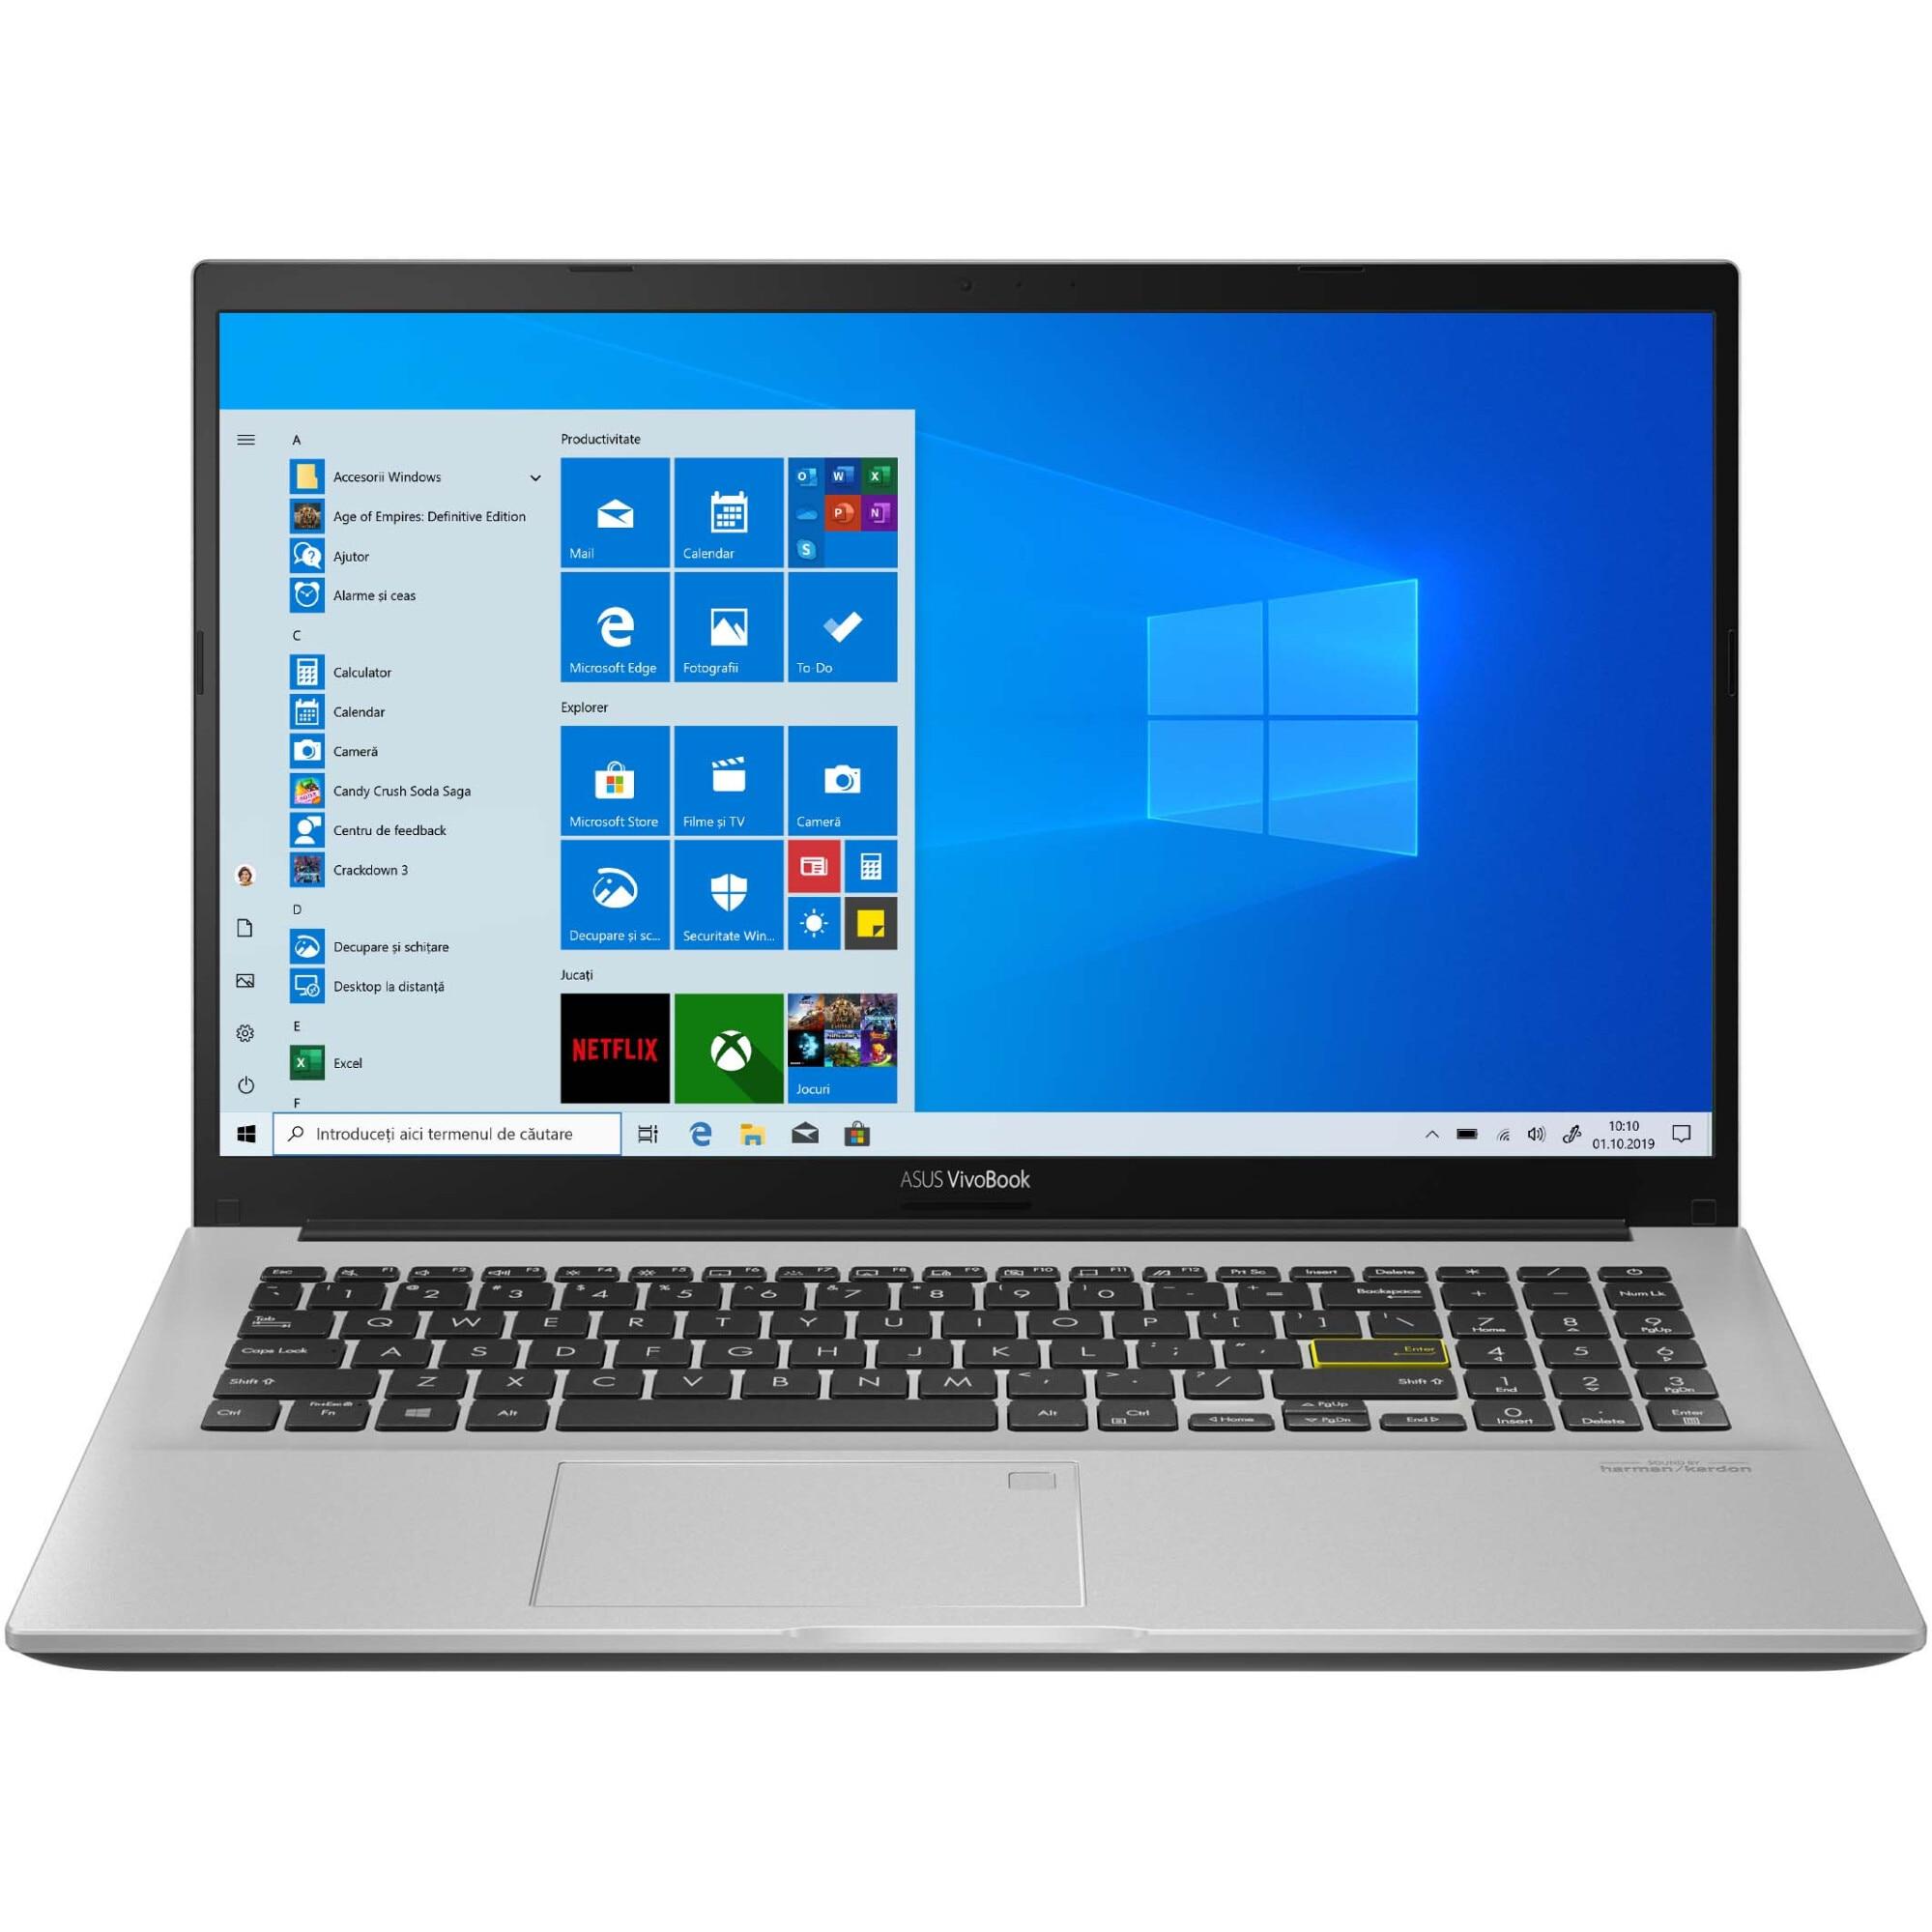 "Fotografie Laptop ASUS VivoBook 15 M513IA cu procesor AMD Ryzen™ 5 4500U pana la 4.00 GHz, 15.6"", Full HD, 8GB, 512GB SSD, AMD Radeon™ Graphics, Windows 10 Home, Dreamy White"